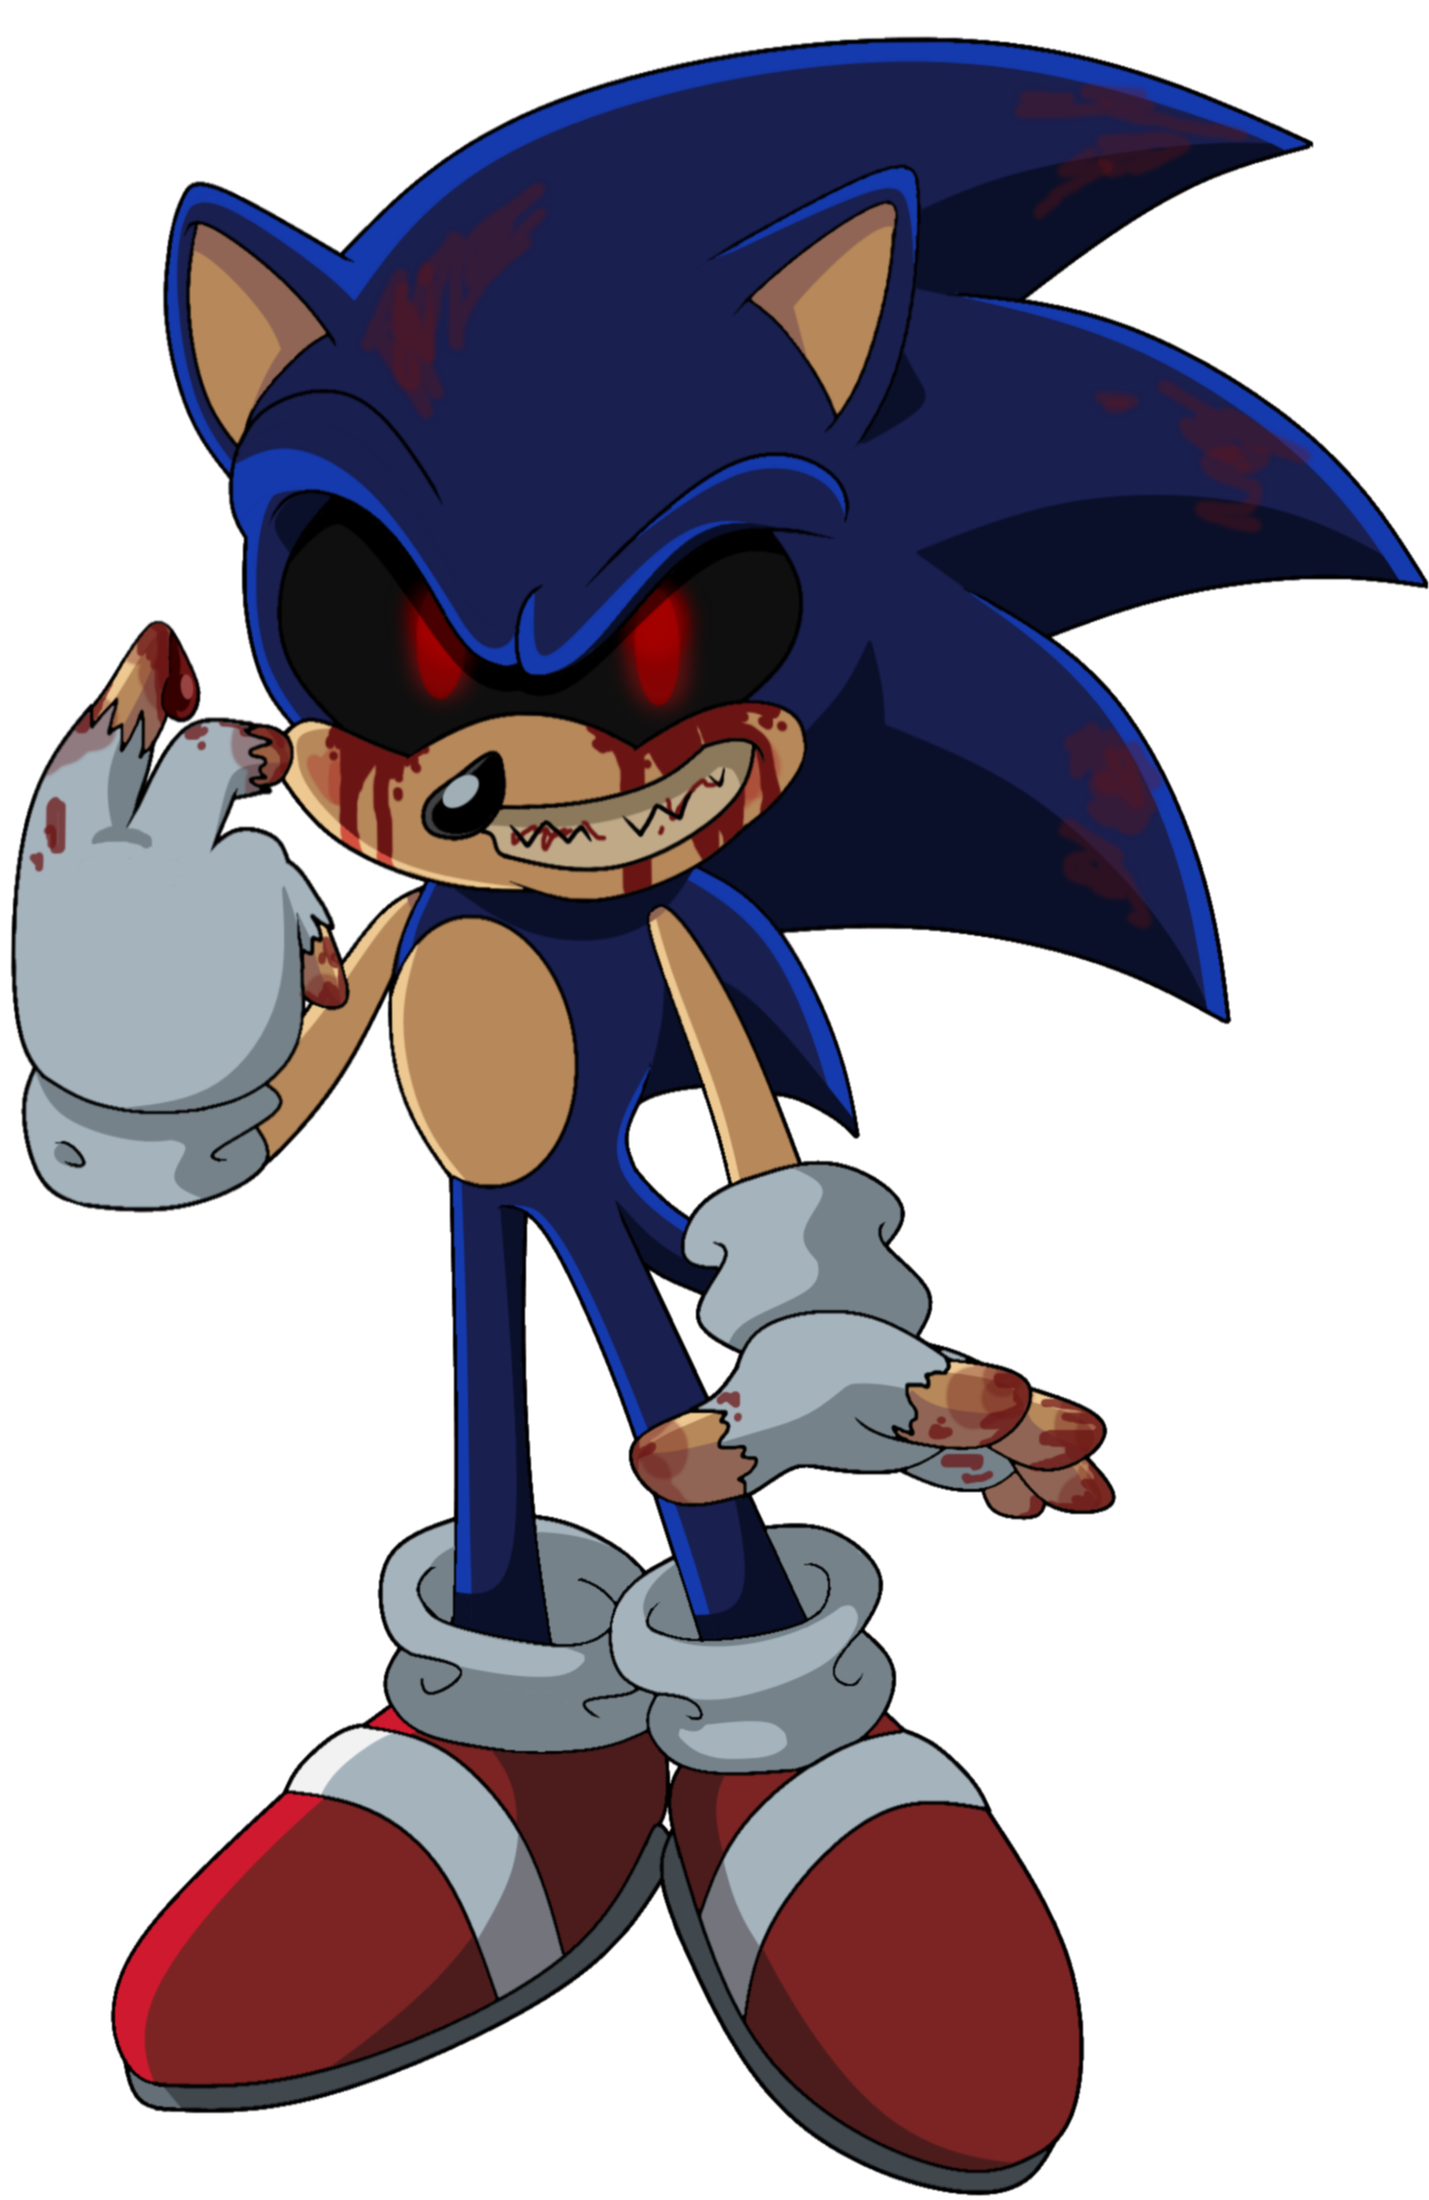 Sonic exe | AWEGAMER2015 Wikia | FANDOM powered by Wikia